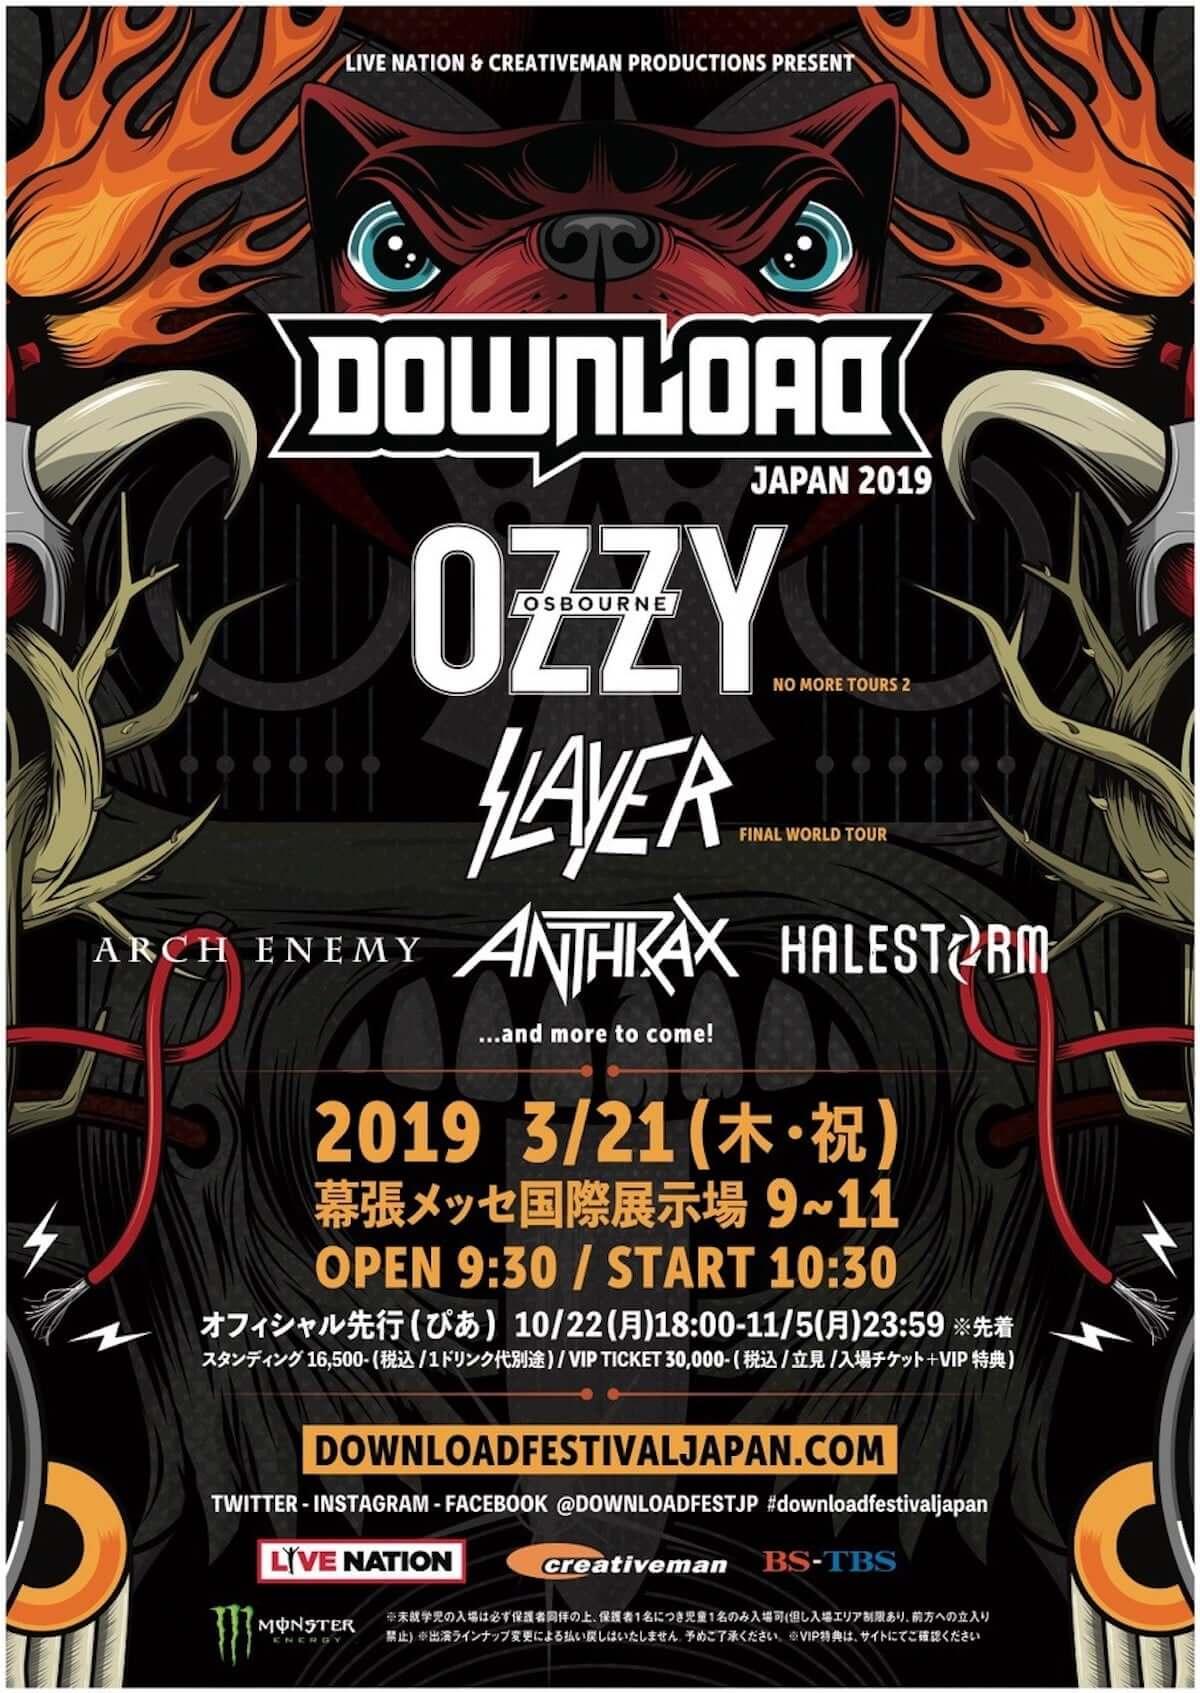 Download Festival Japan第一弾でオジー・オズボーン、スレイヤー、アーチ・エネミー、アンスラックスら発表! music181015_downloadfestivaljapan_01-1200x1693